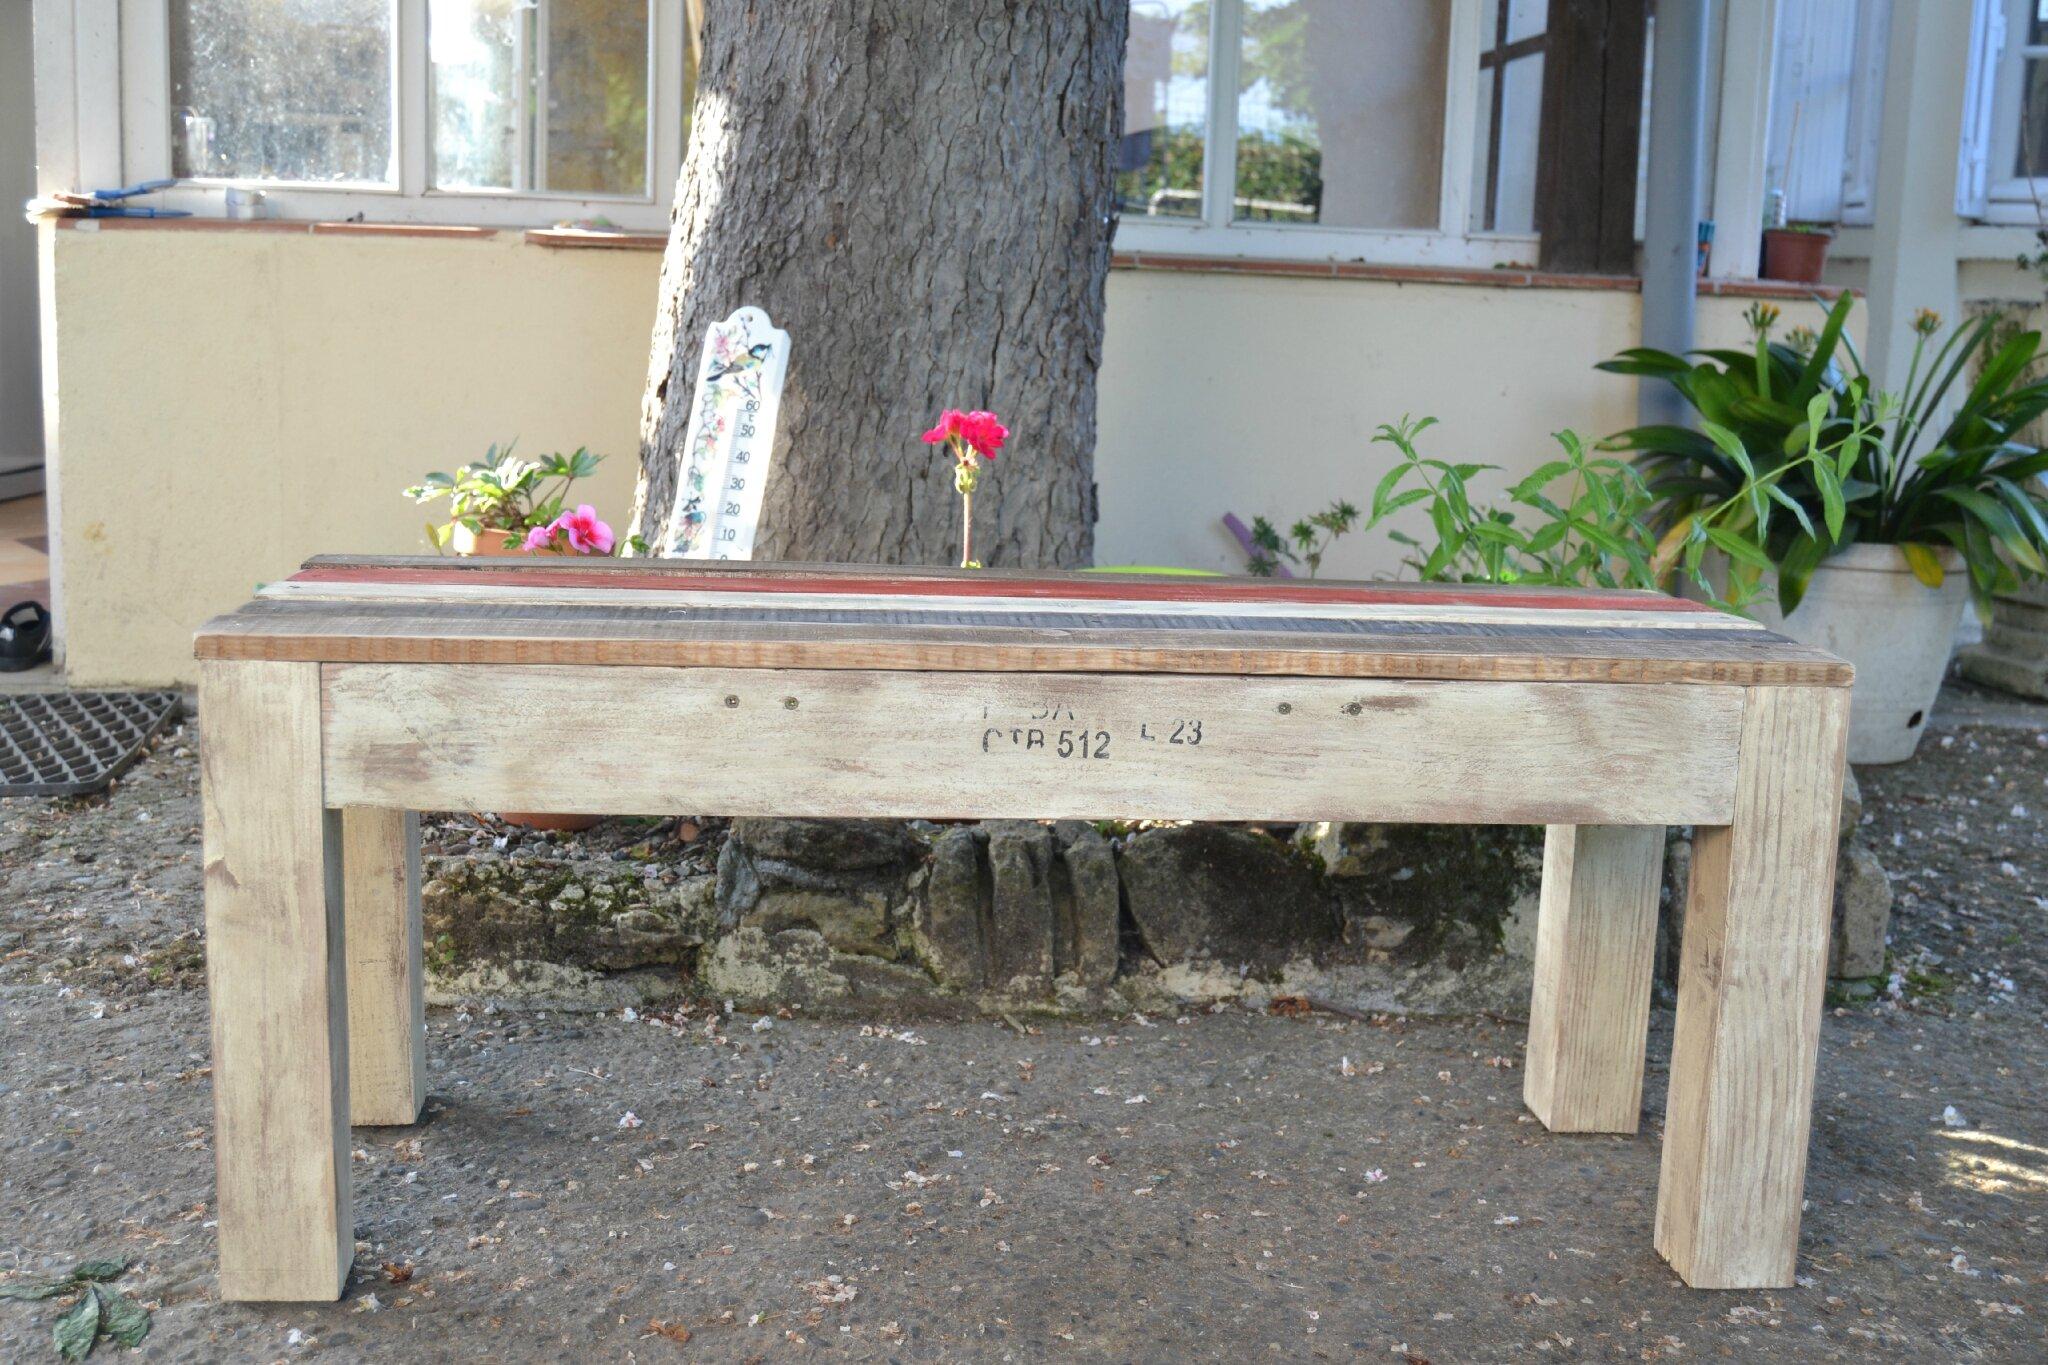 Banc En Bois De Palette : banc en bois de palette – LES LOISIRS D'ANGEGABY